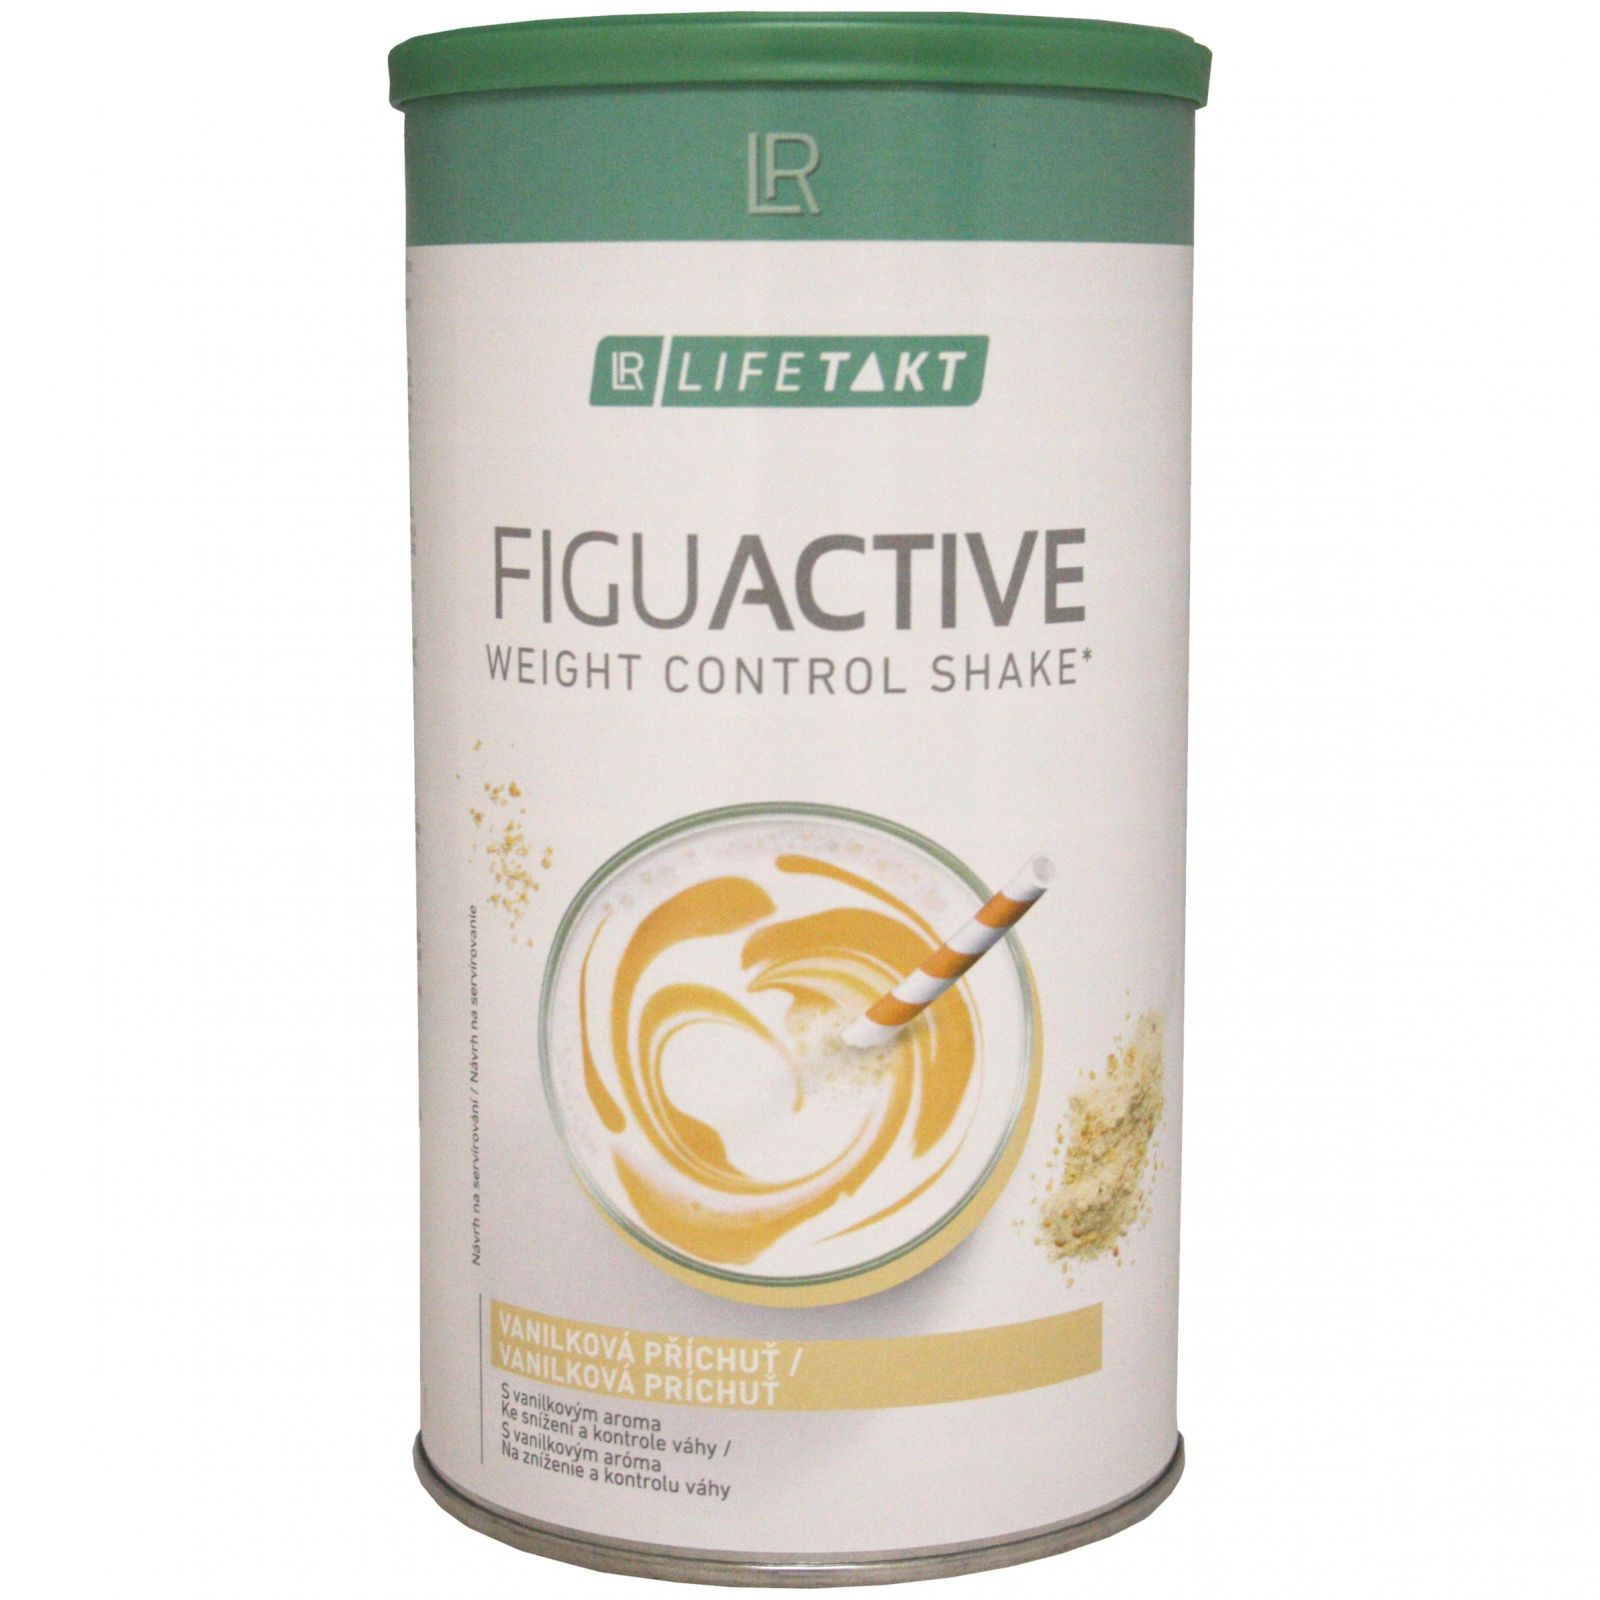 LR LIFETAKT Figu Active koktejl 450 g - příchuť vanilka